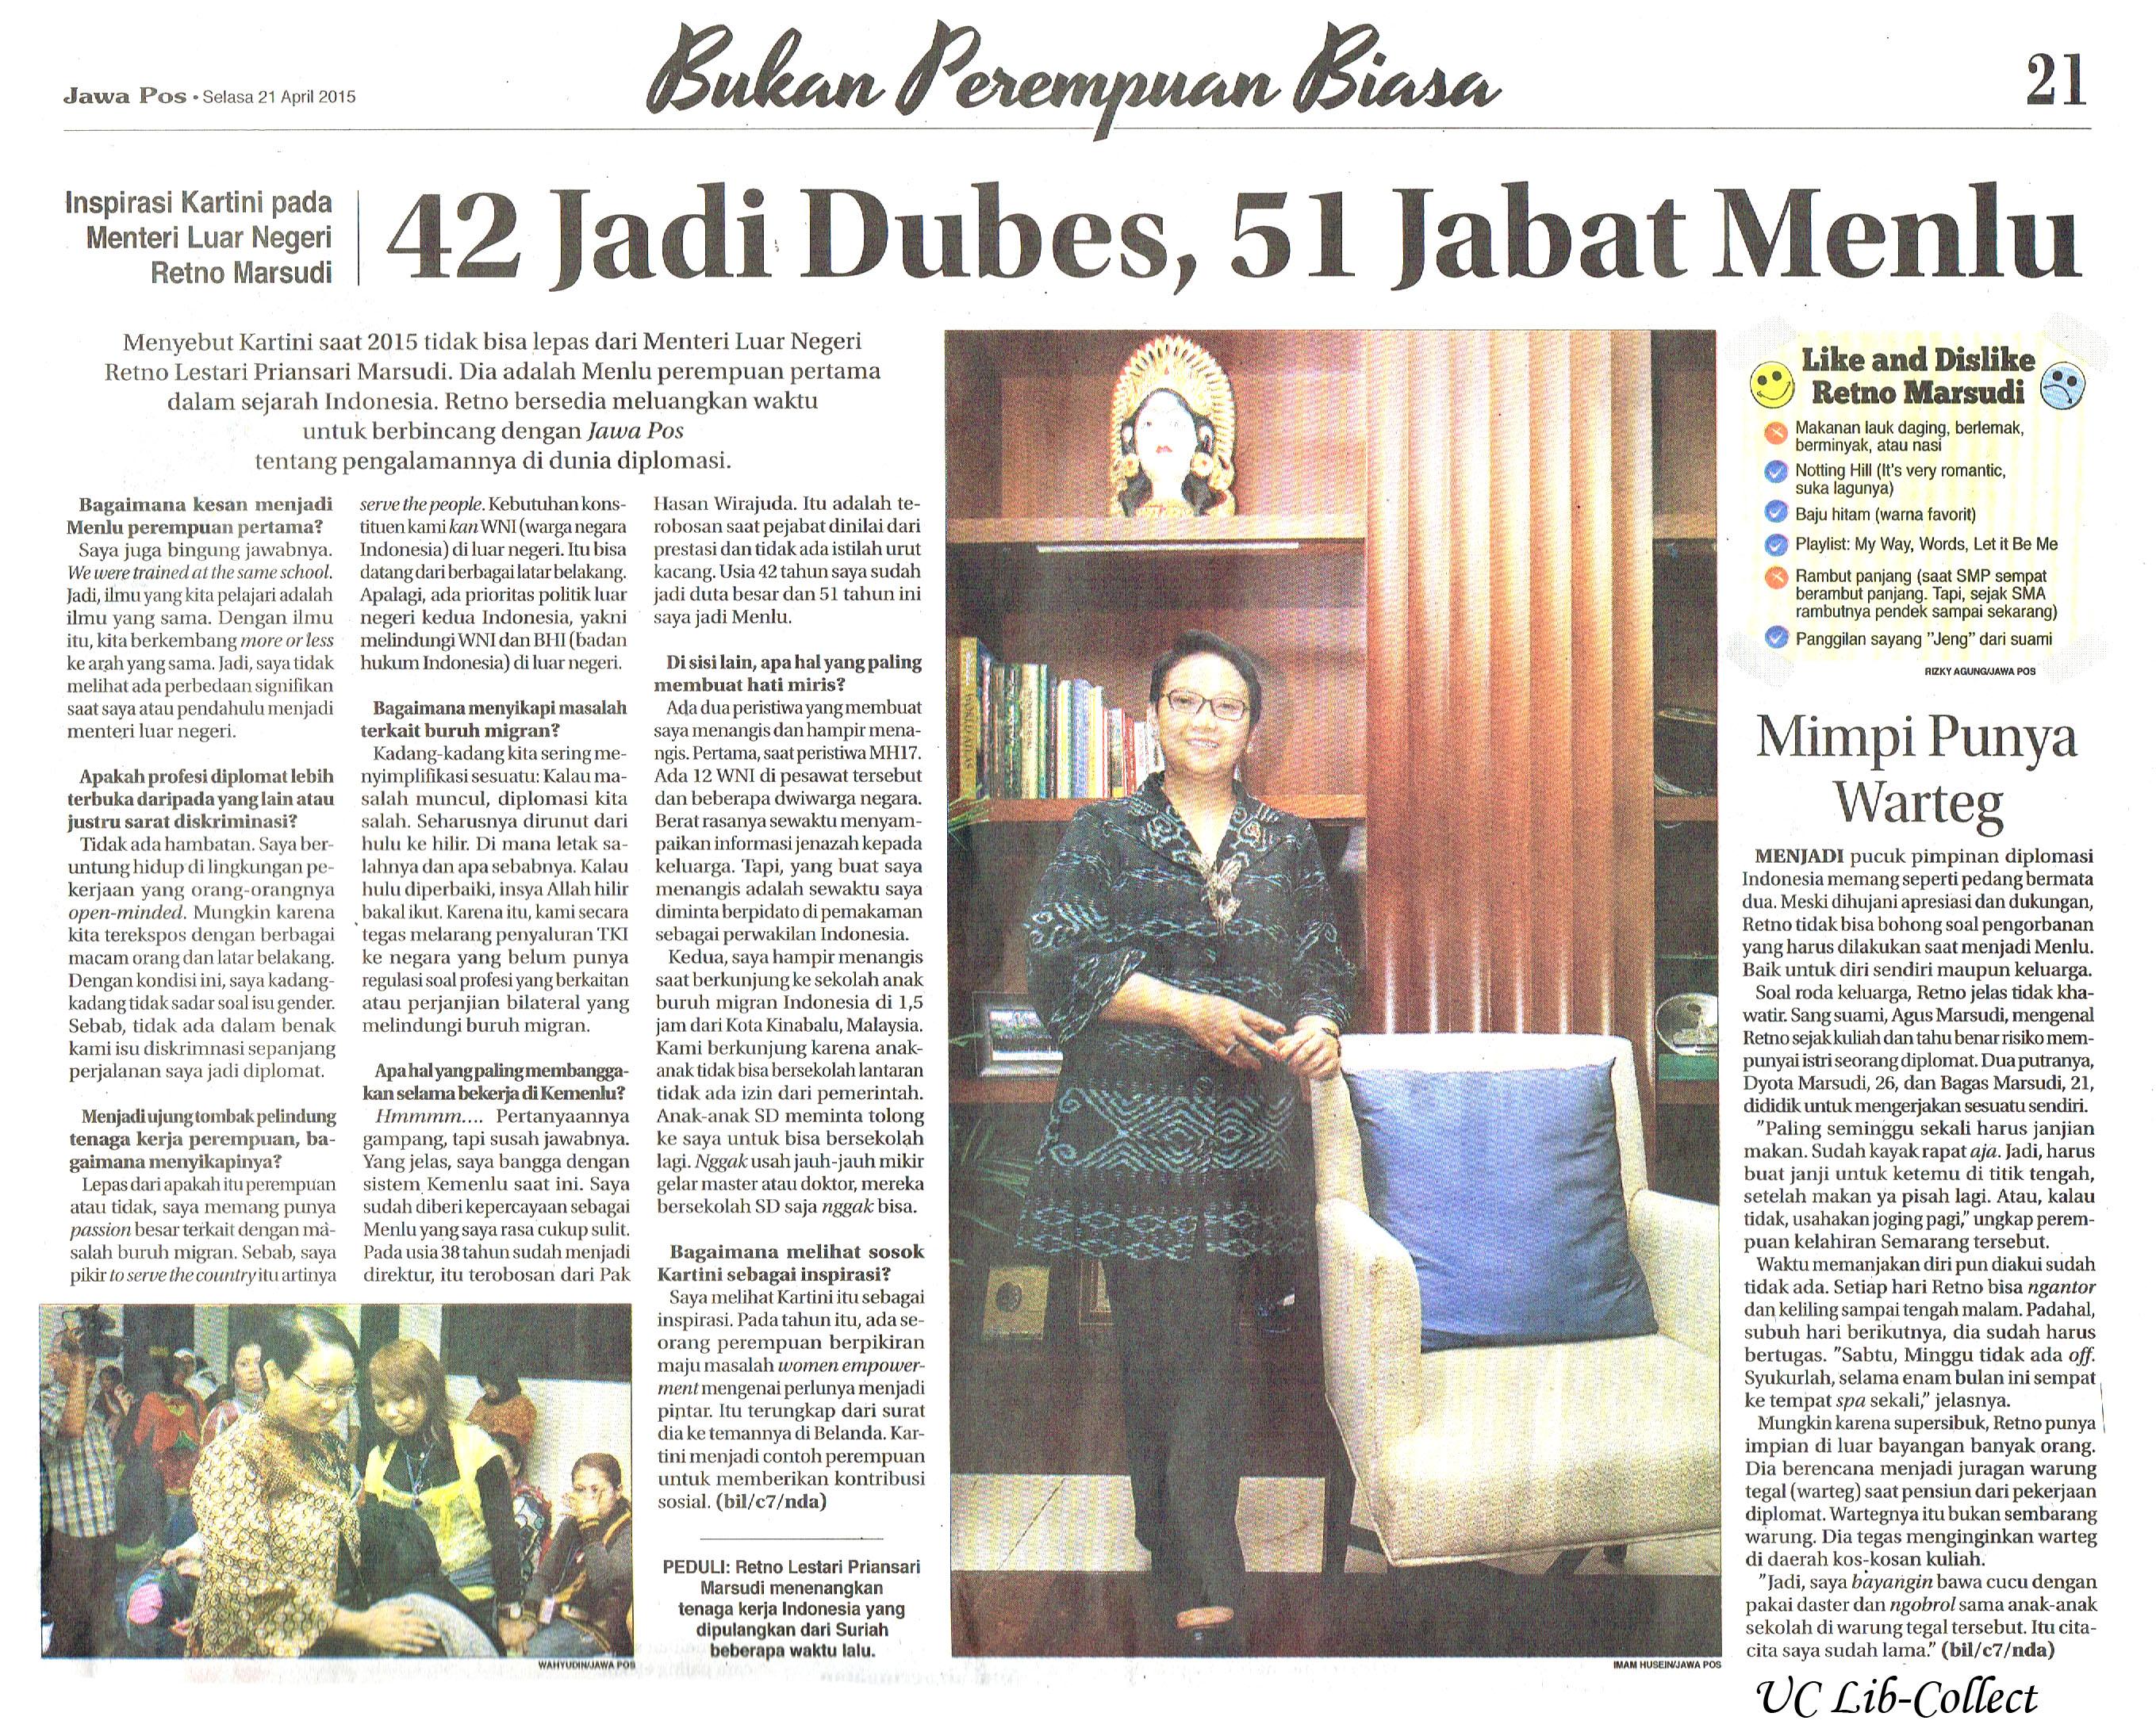 42 Jadi Dubes 51 Jabat Menlu Jawa Pos 21 April 2014 Hal